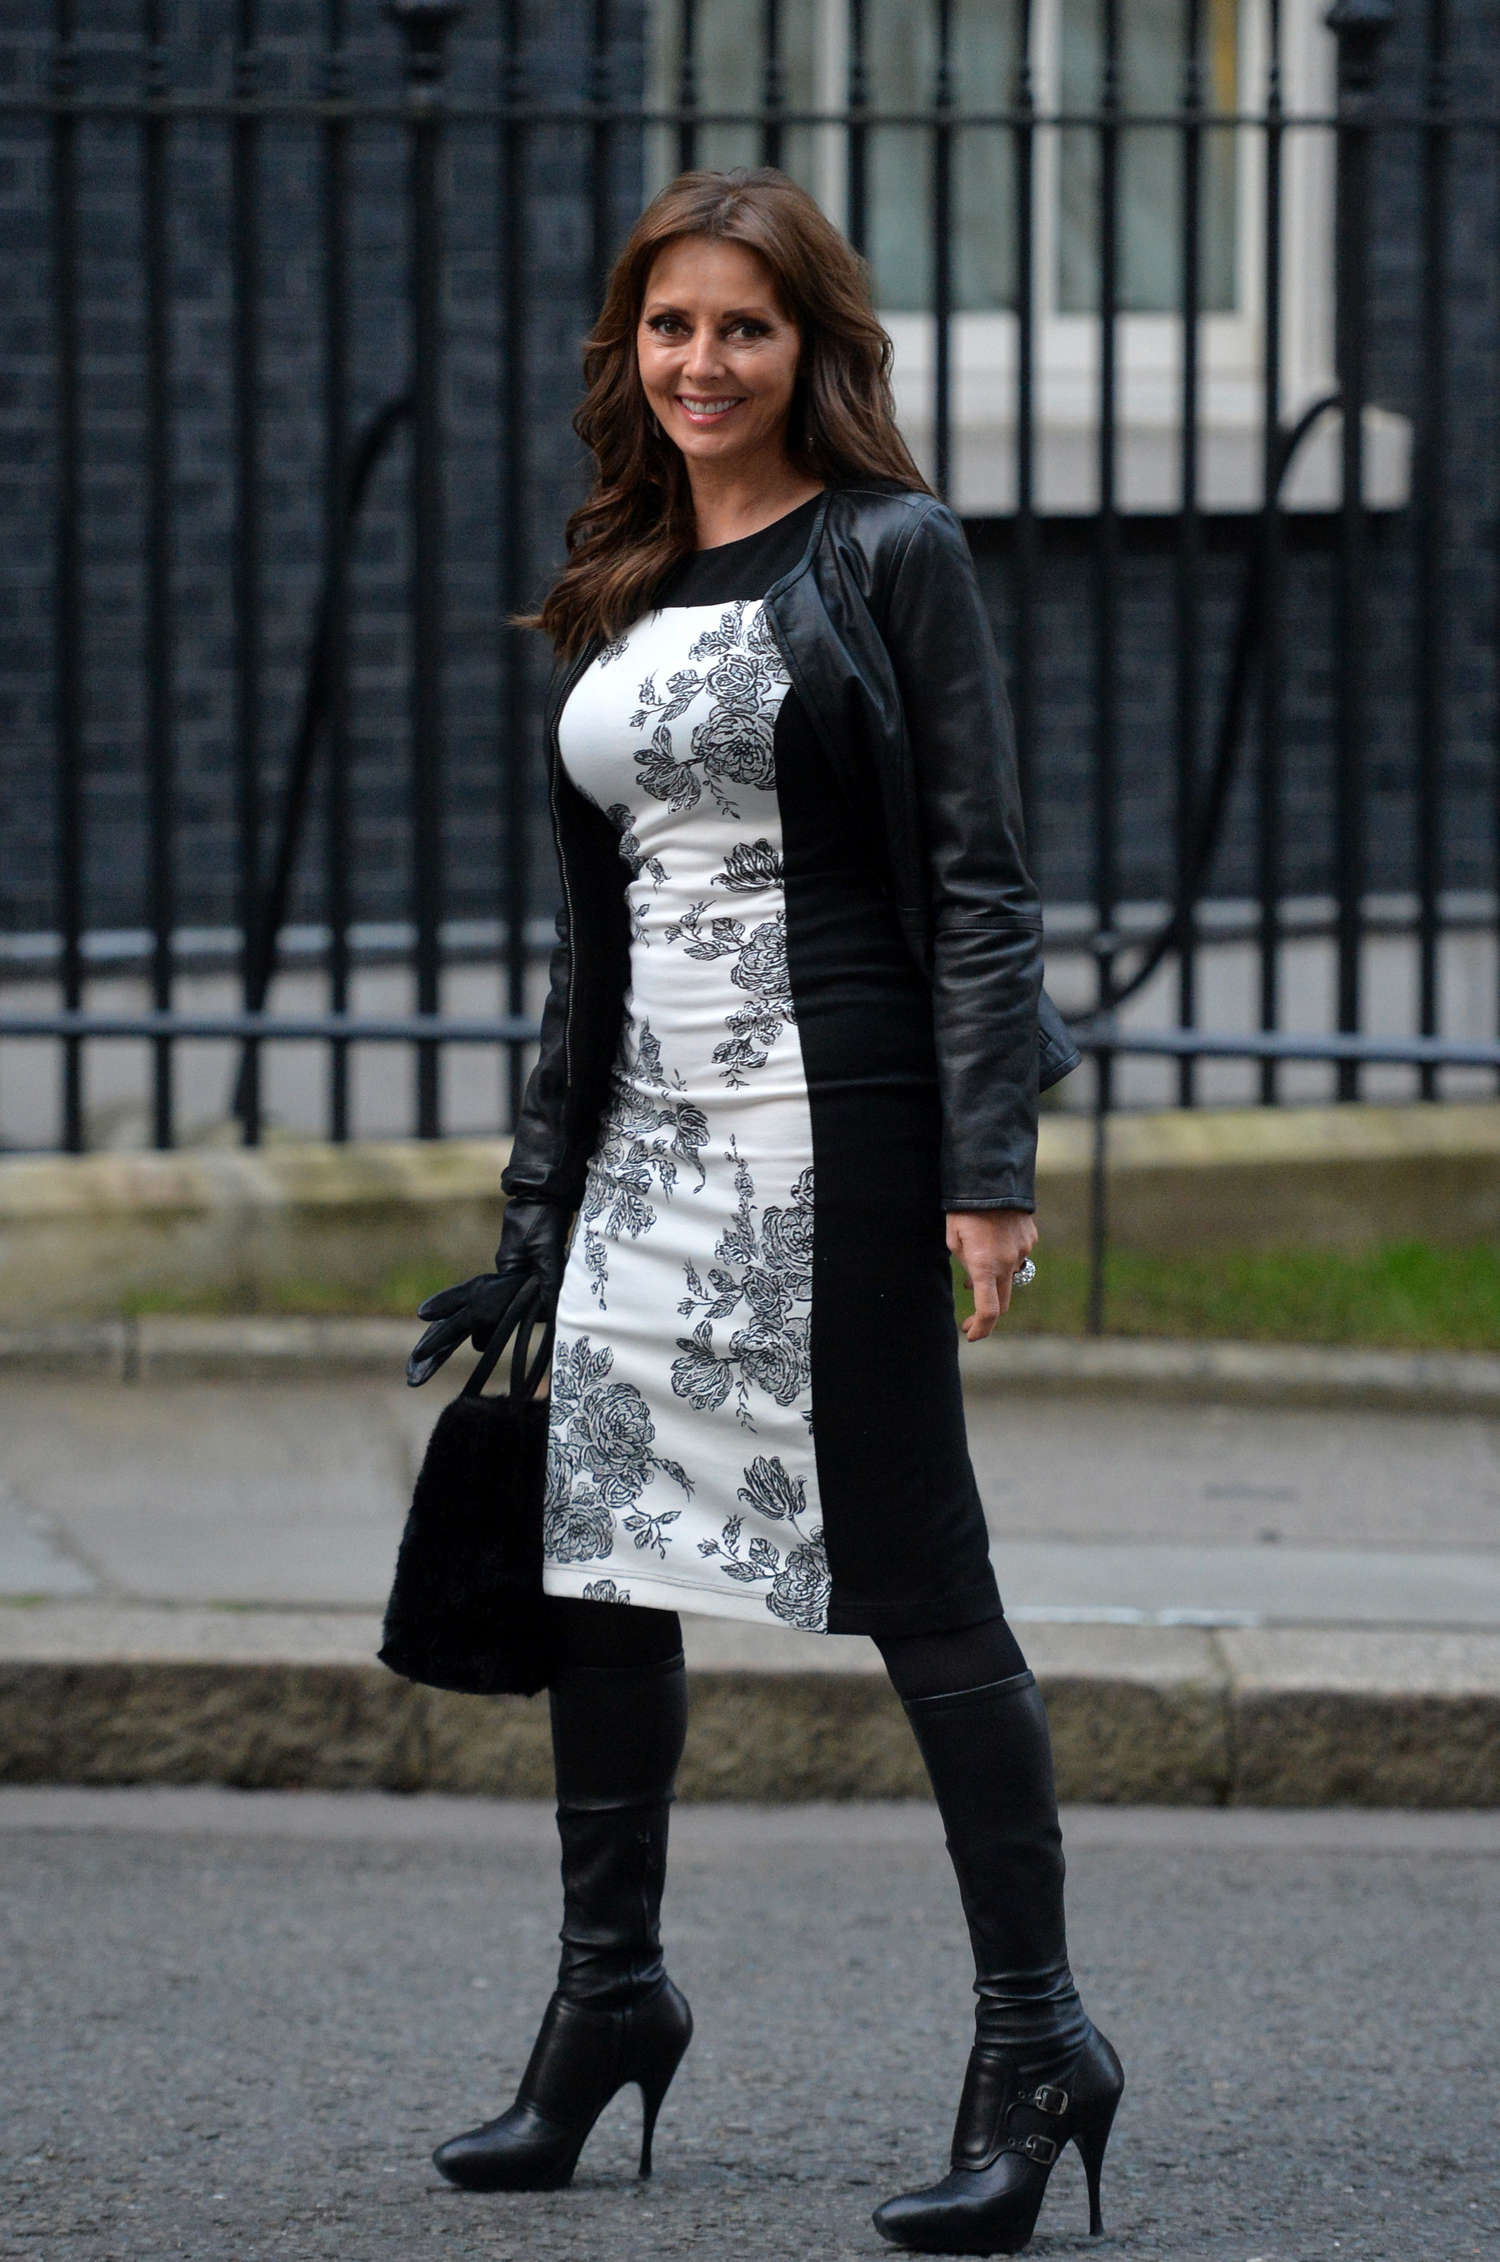 Carol Vorderman Downing Street in London